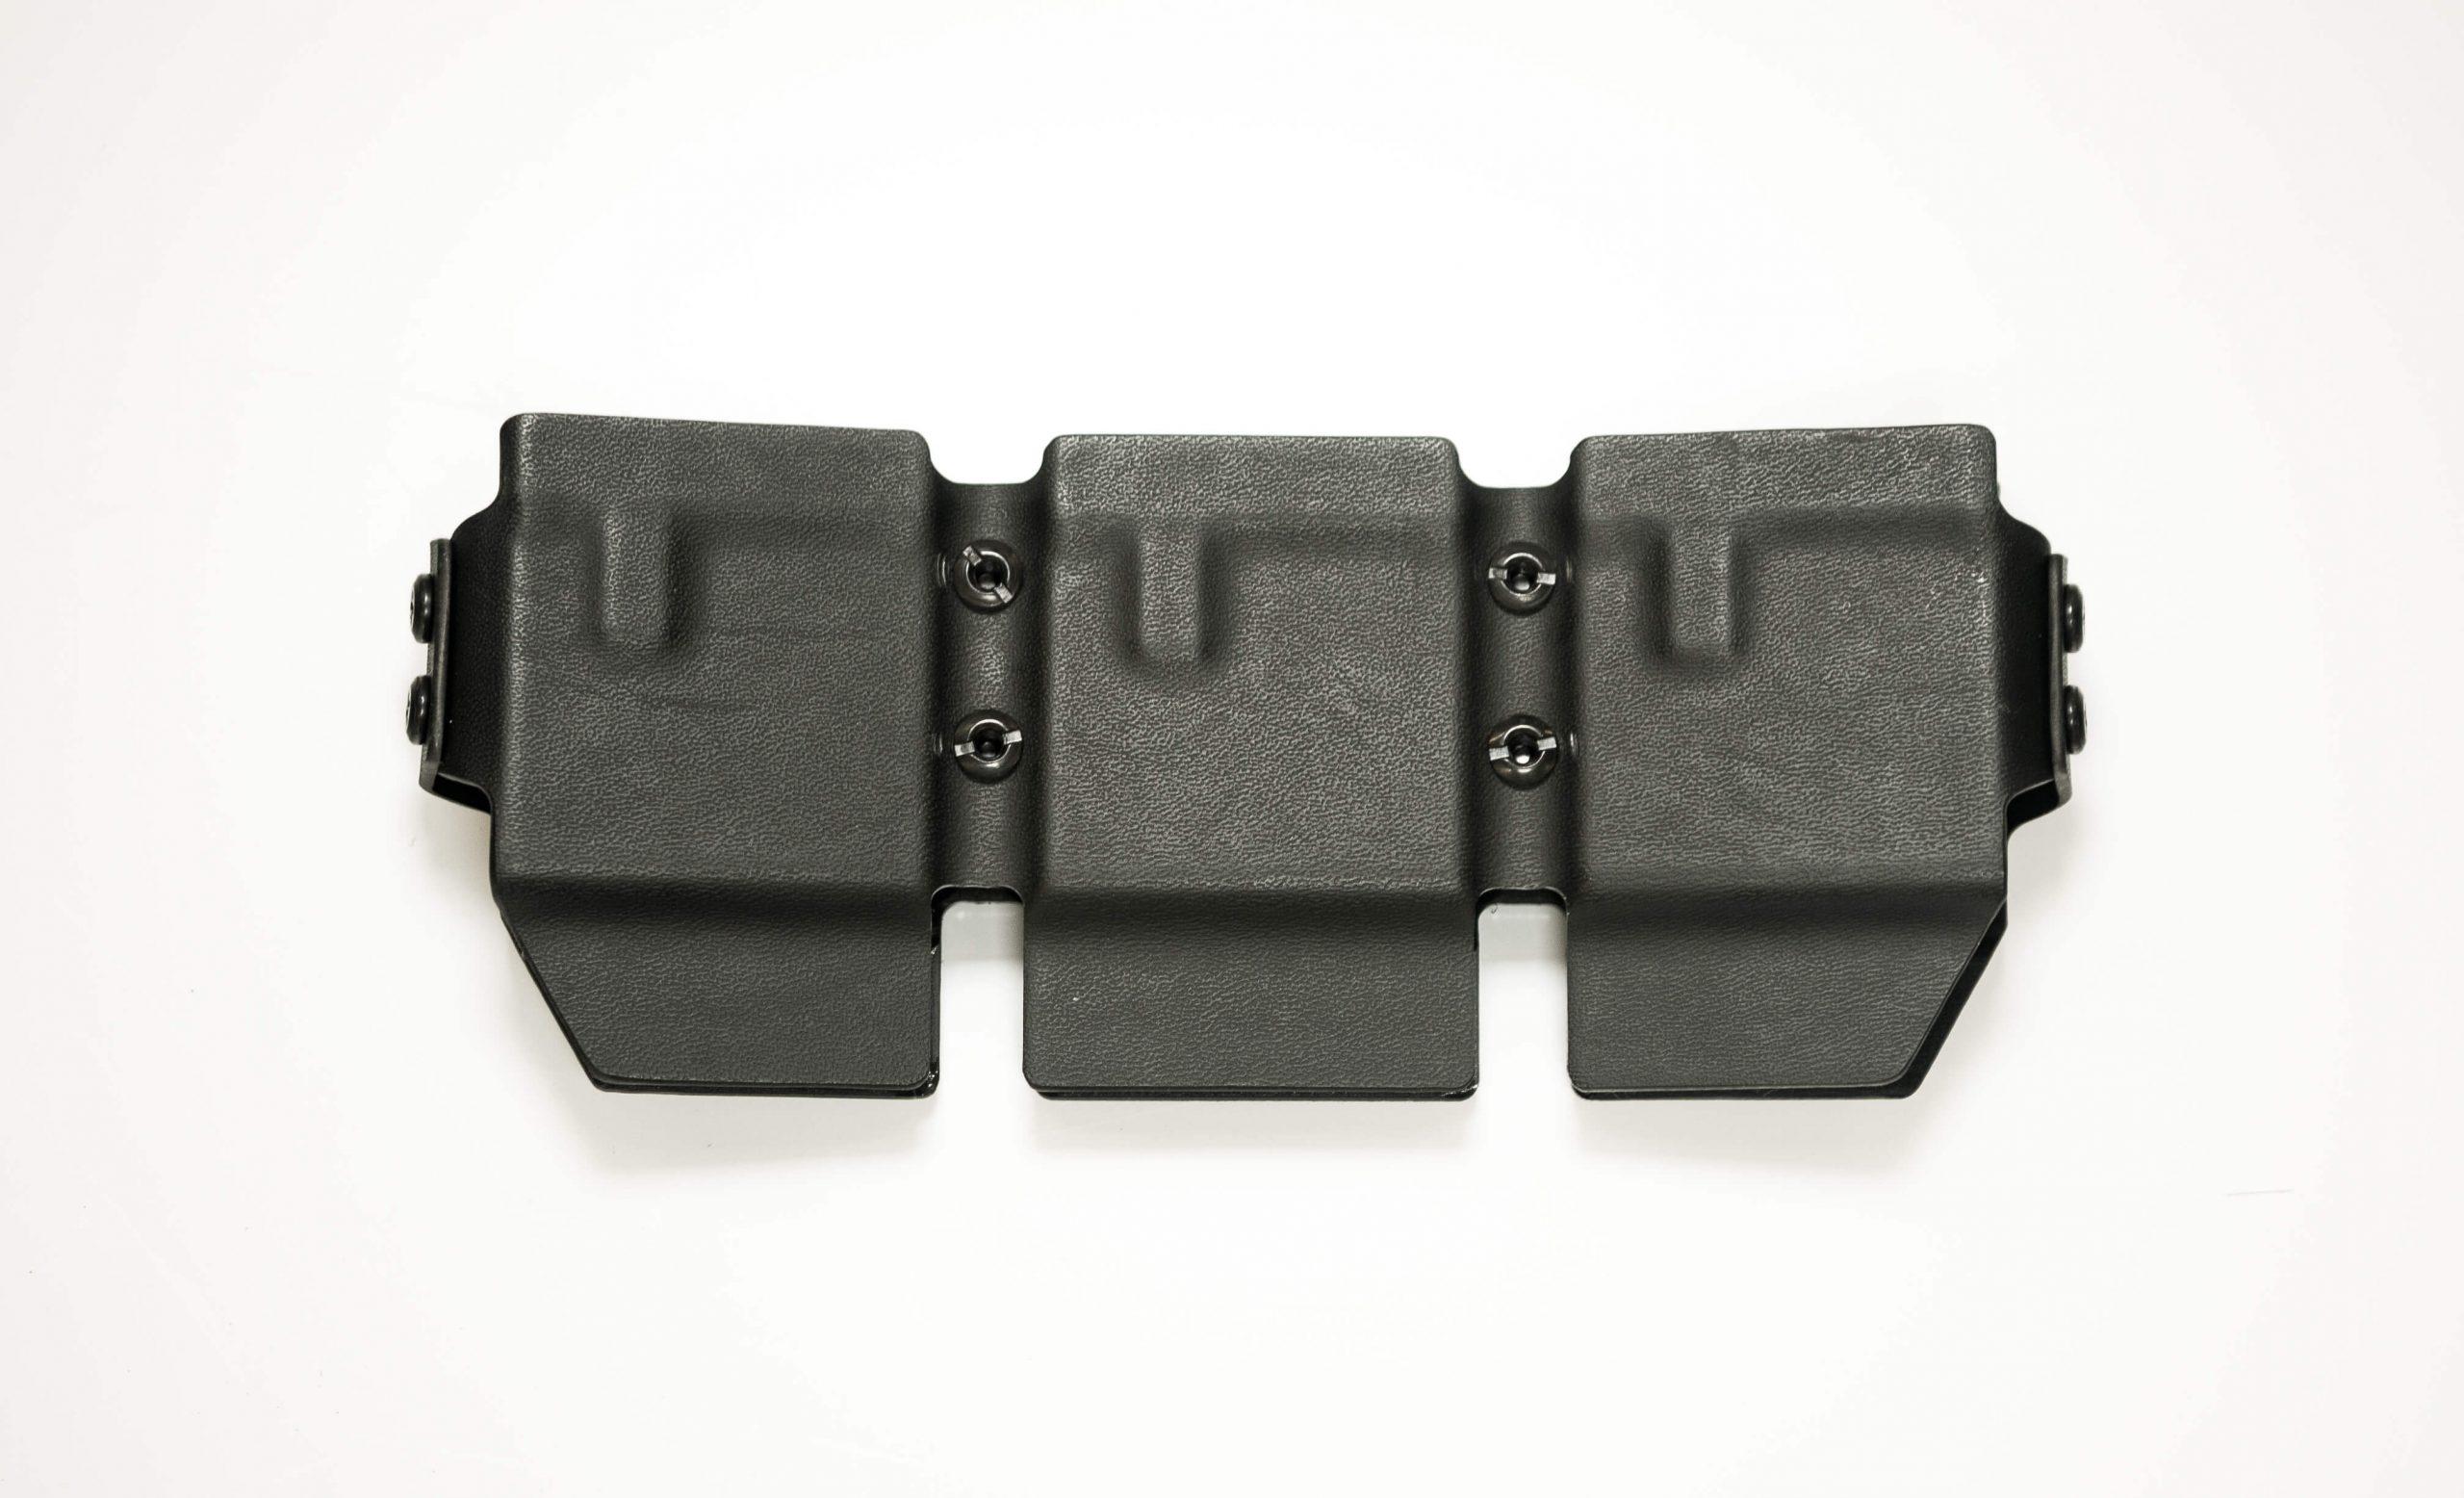 anr designs ghidorah 556 placard insert 556 magazine carrier plate carrier chest rig